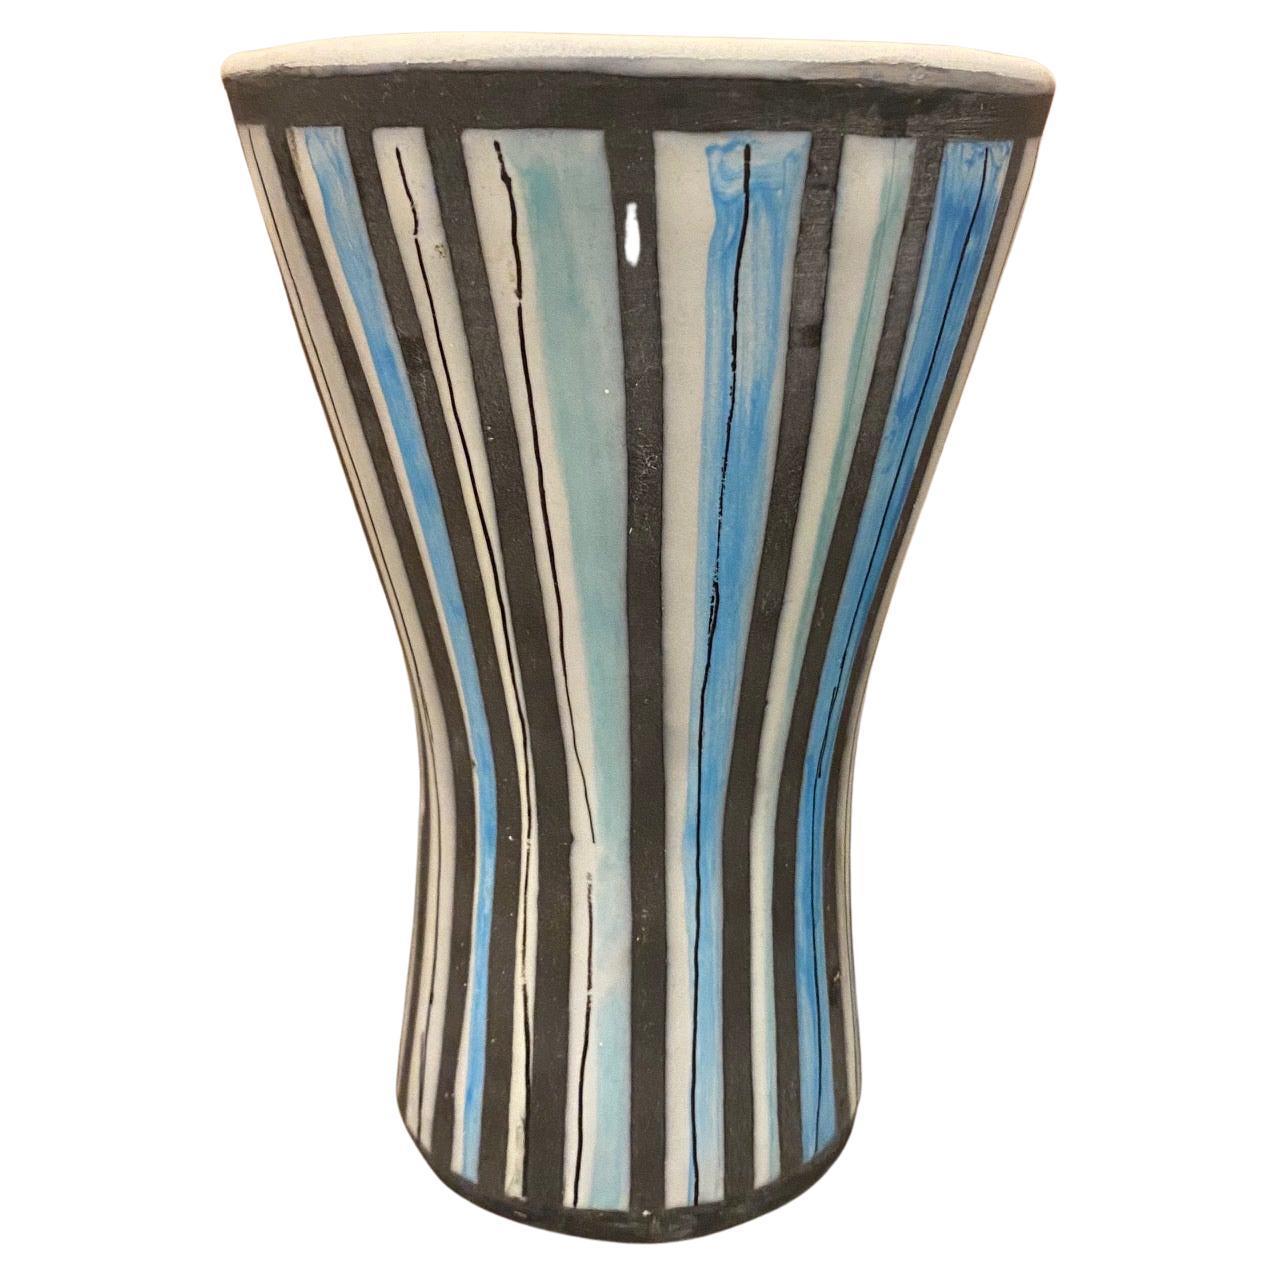 Ceramic Vase by Roger Capron, France, 1950s